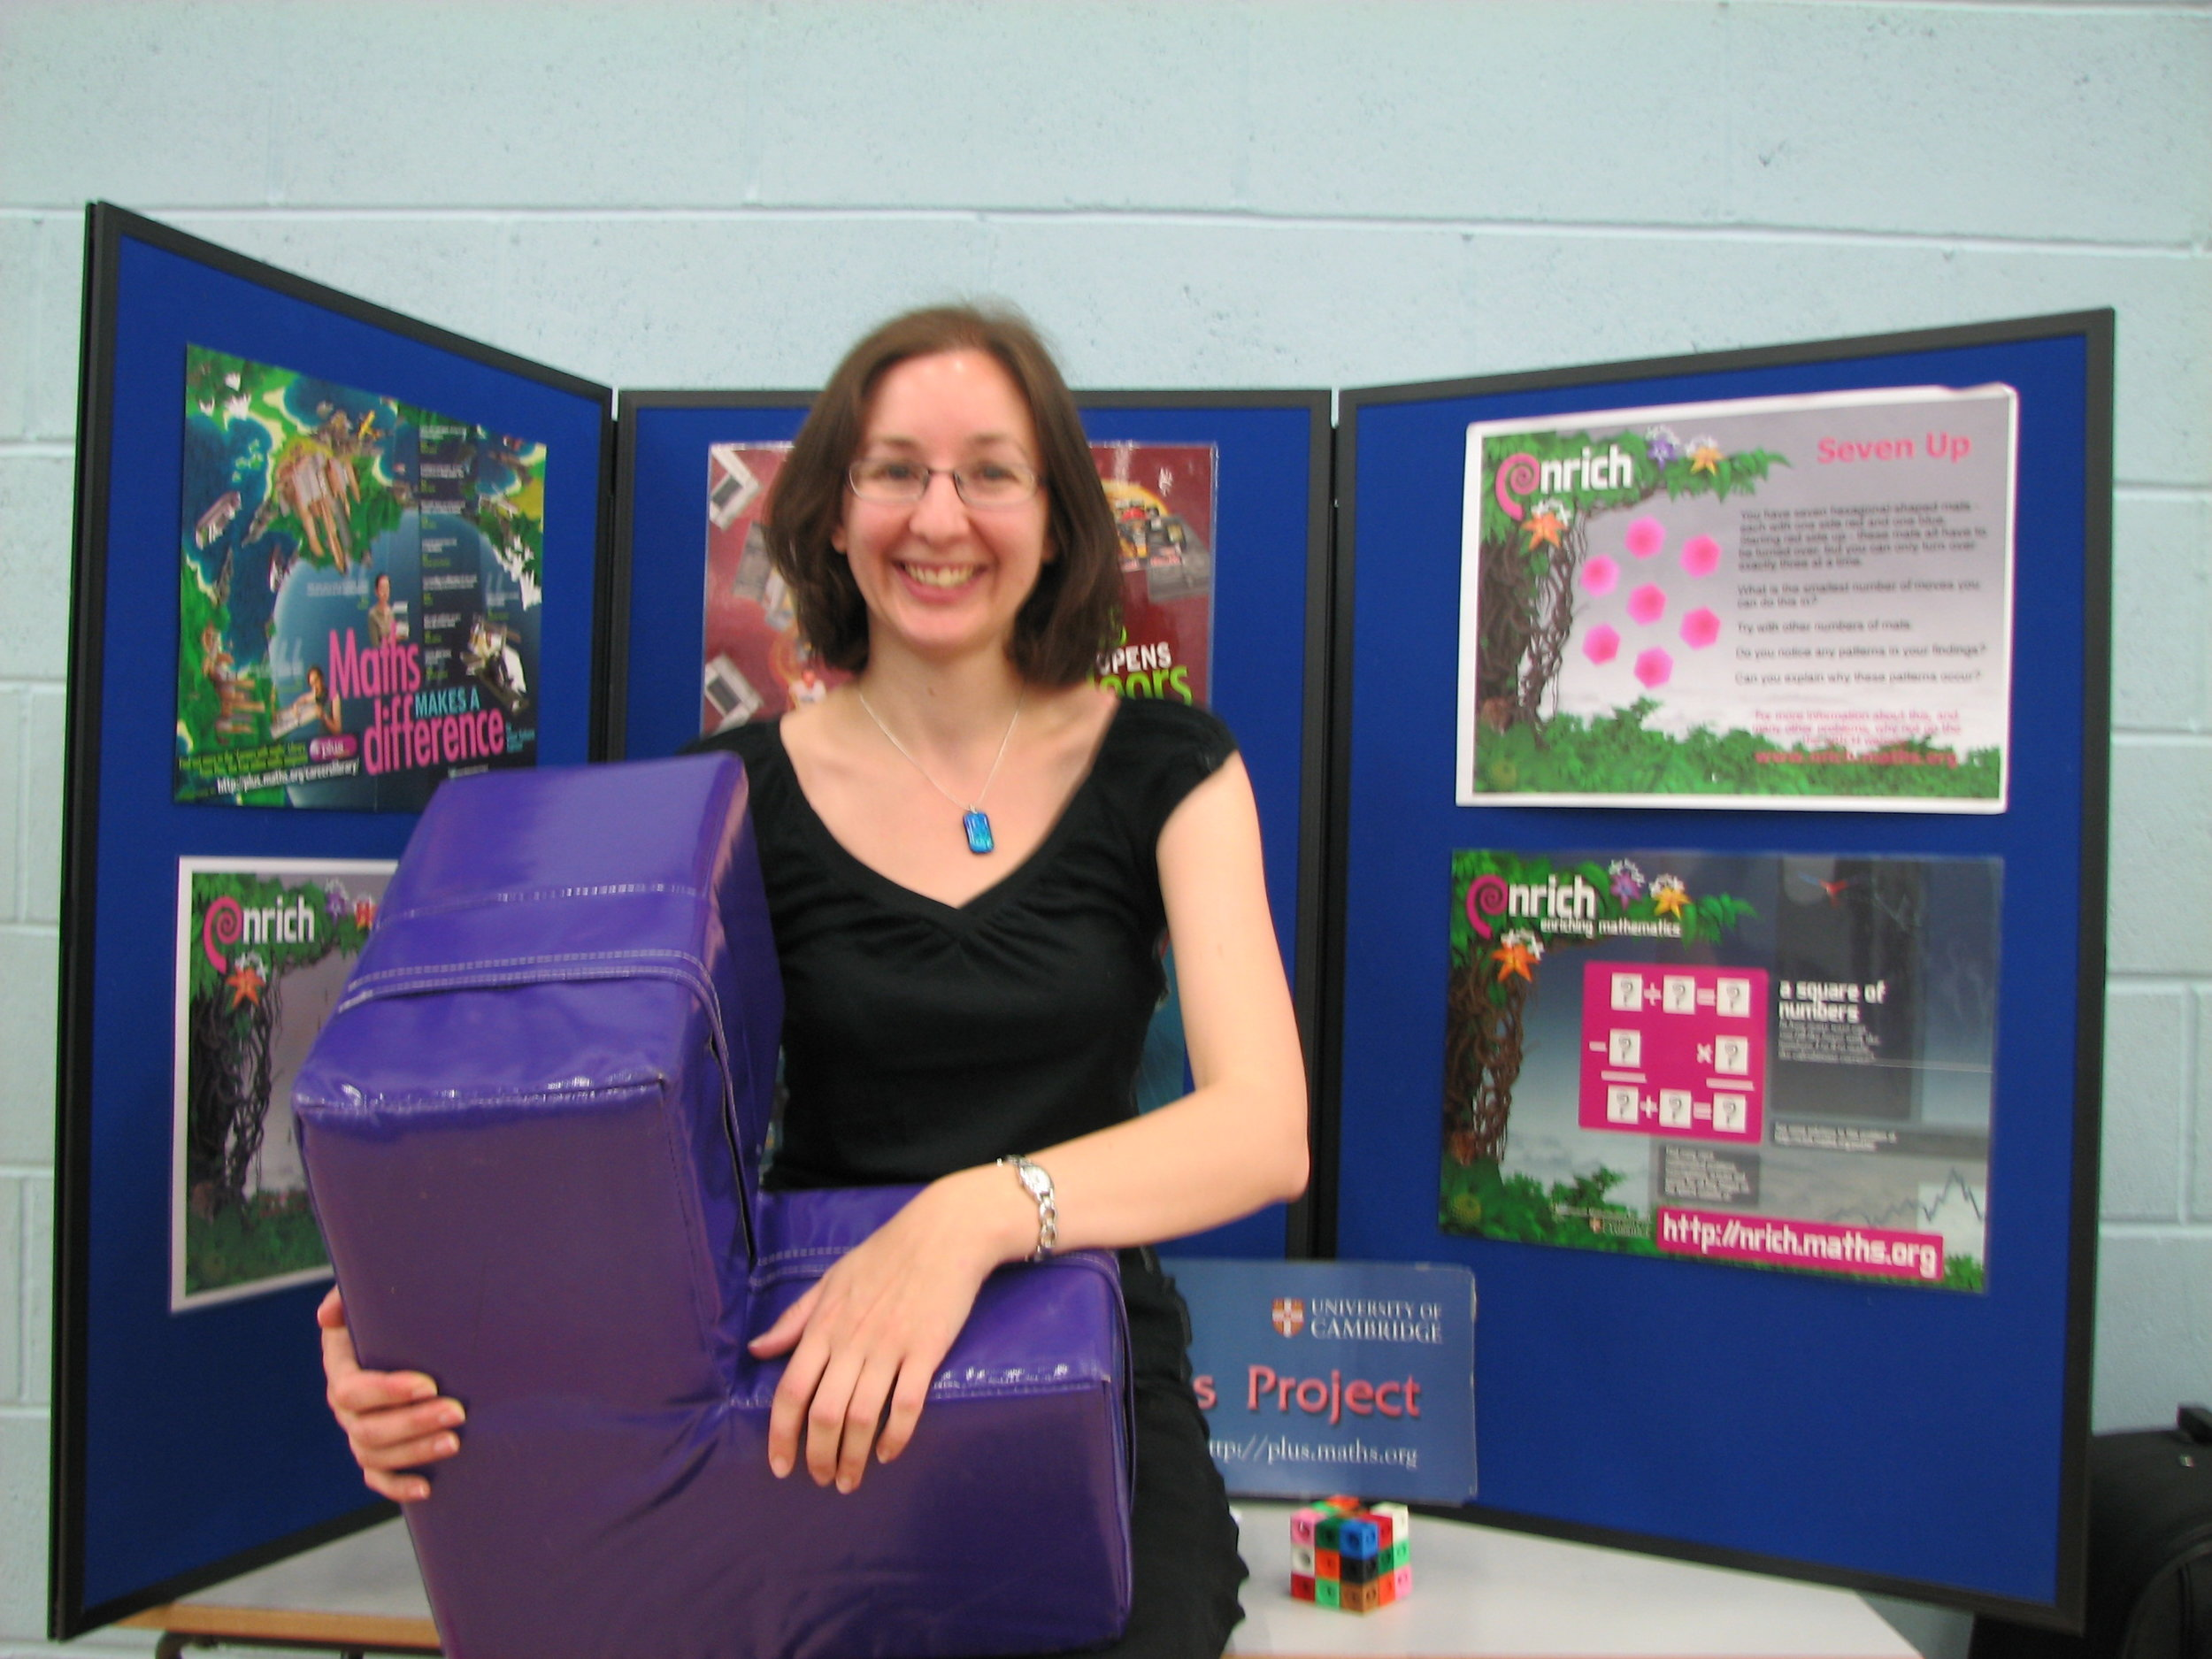 Hands-on Maths Roadshow, University of Cambridge